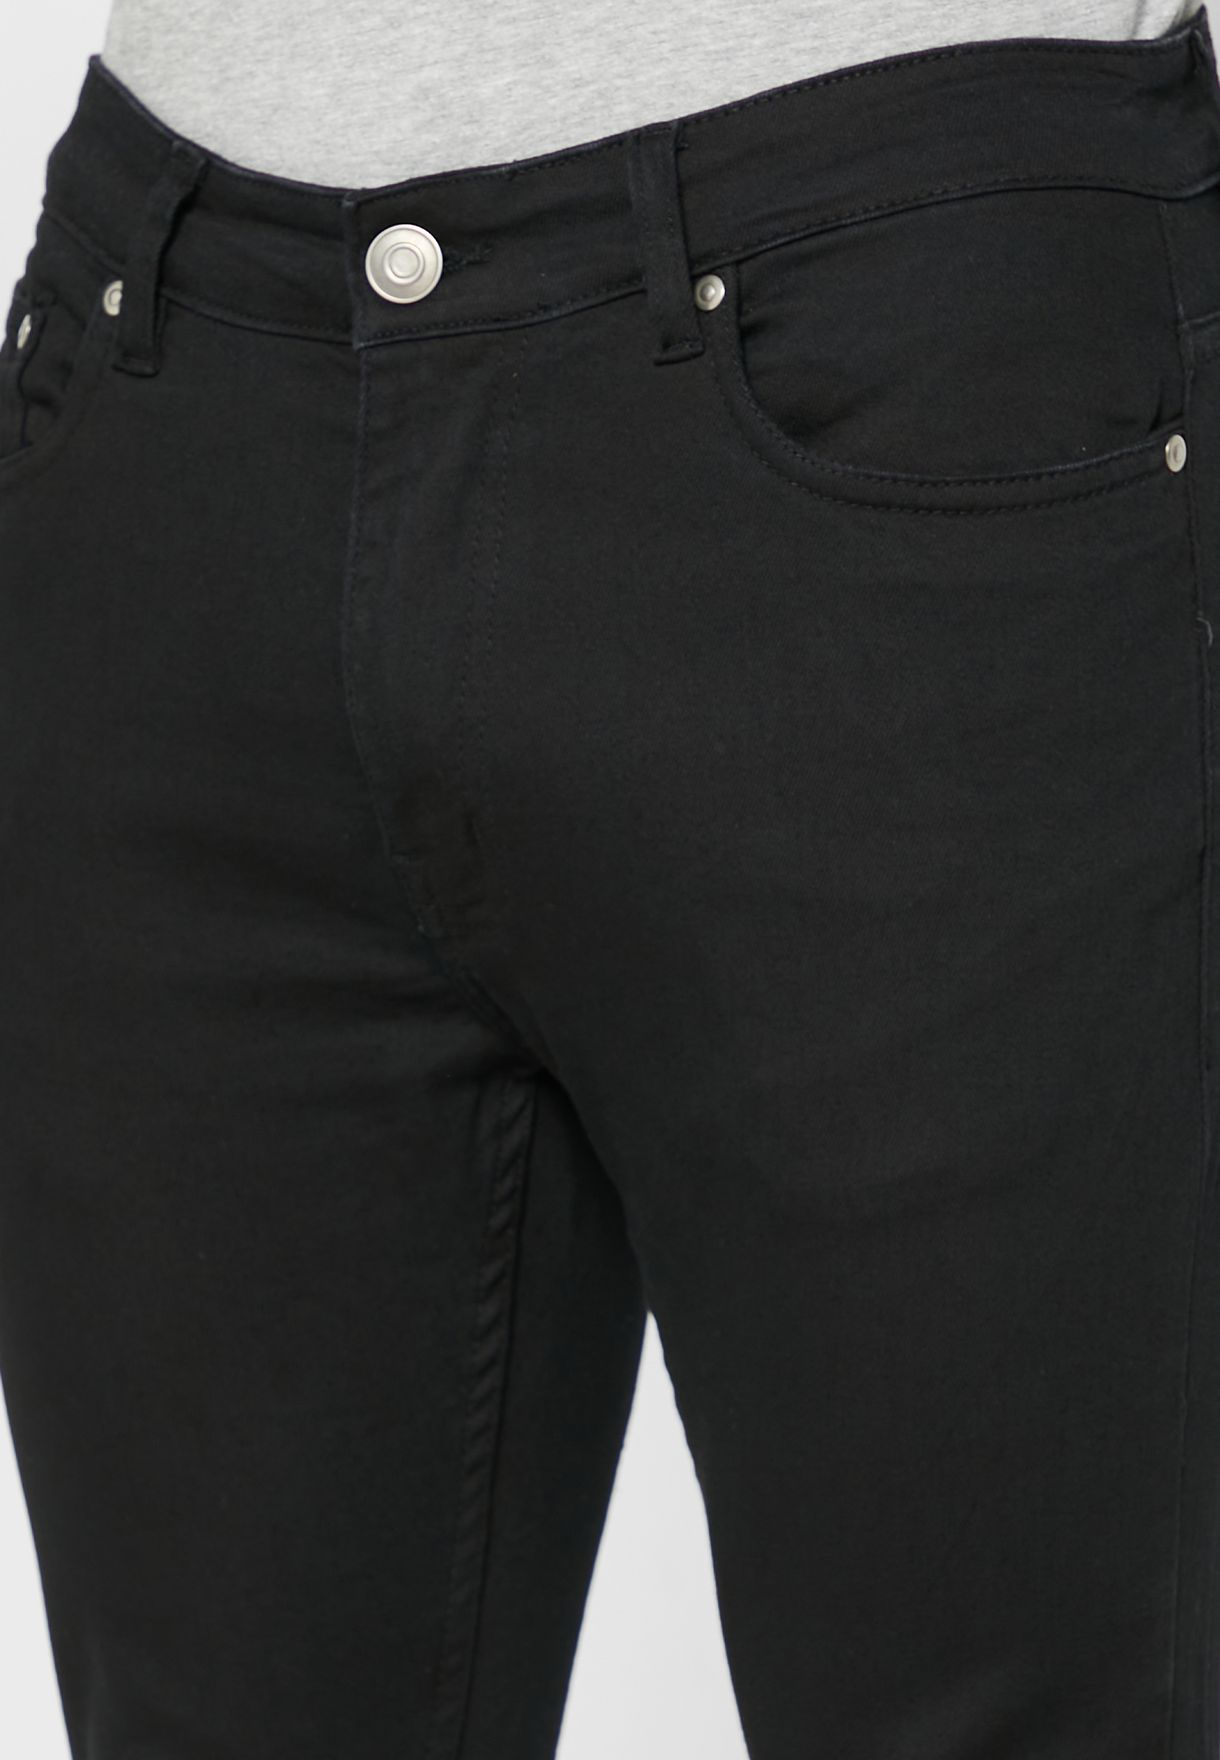 Skinny Fit Jean